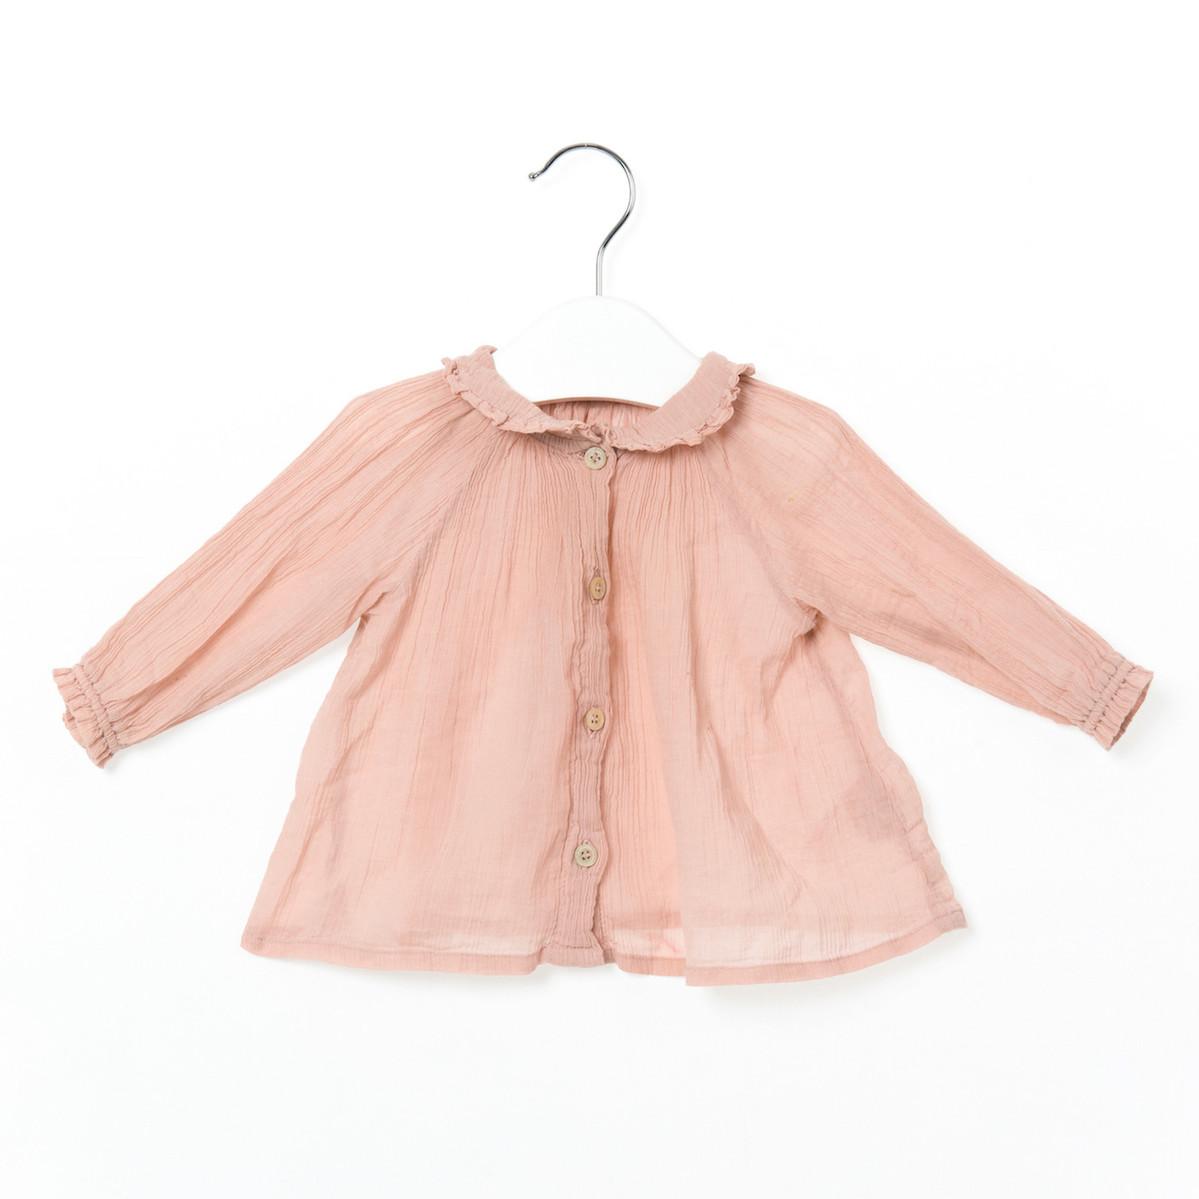 Pale Pink Top 3-6M